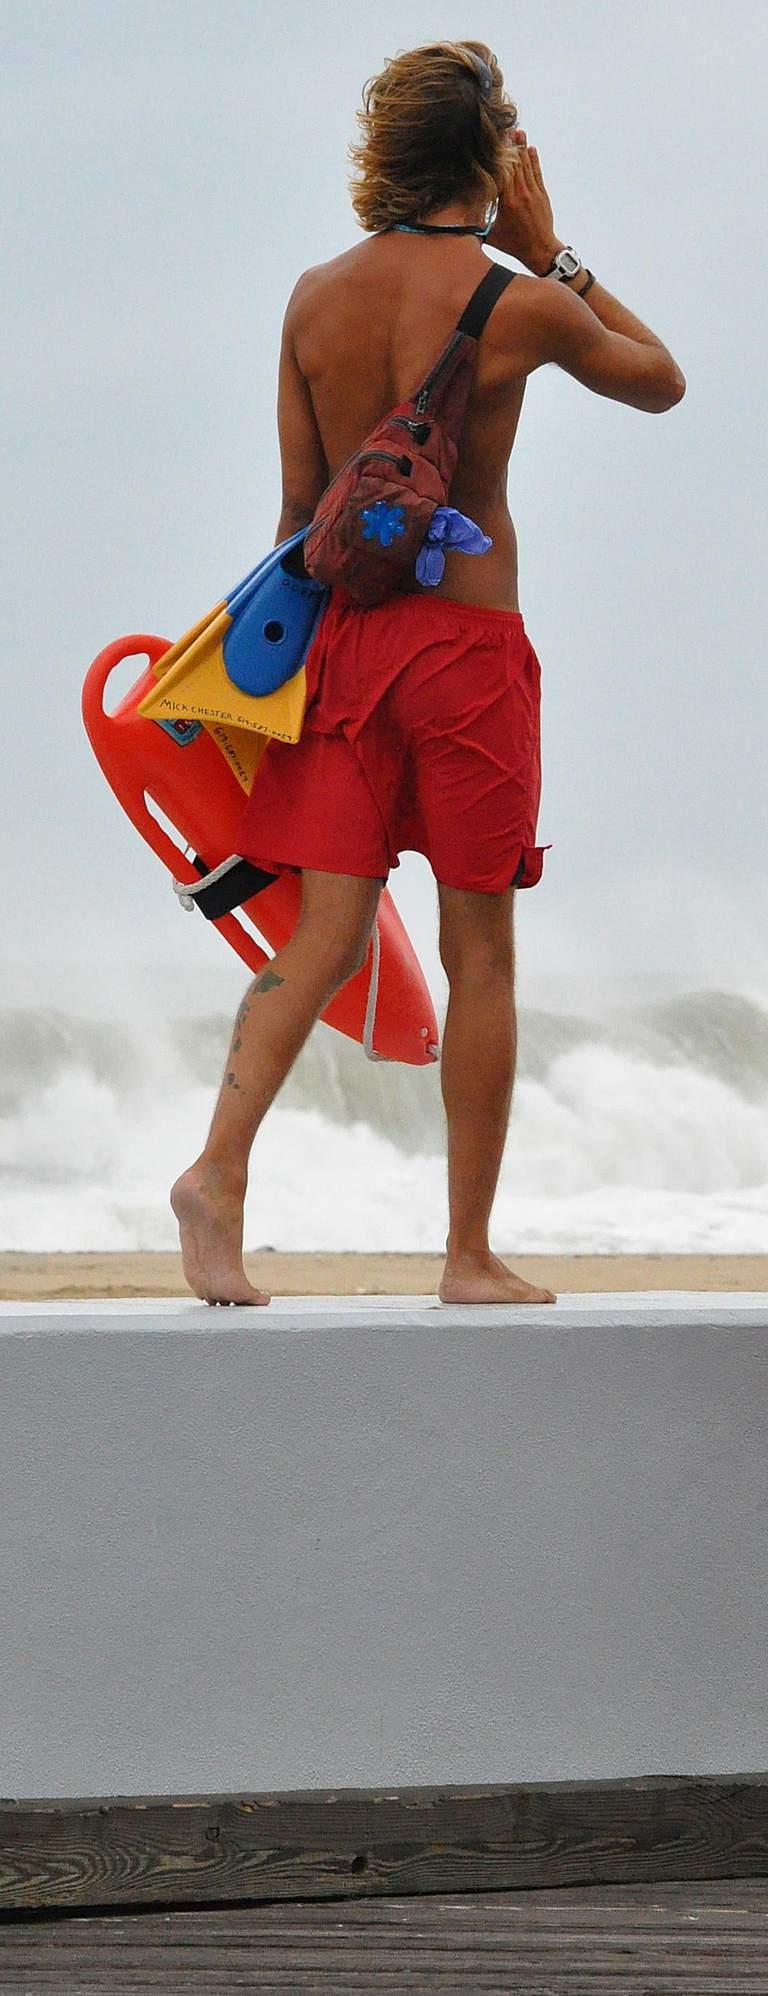 Ocean_City_Maryland_Lifeguard_Hurricane_Earl.jpg